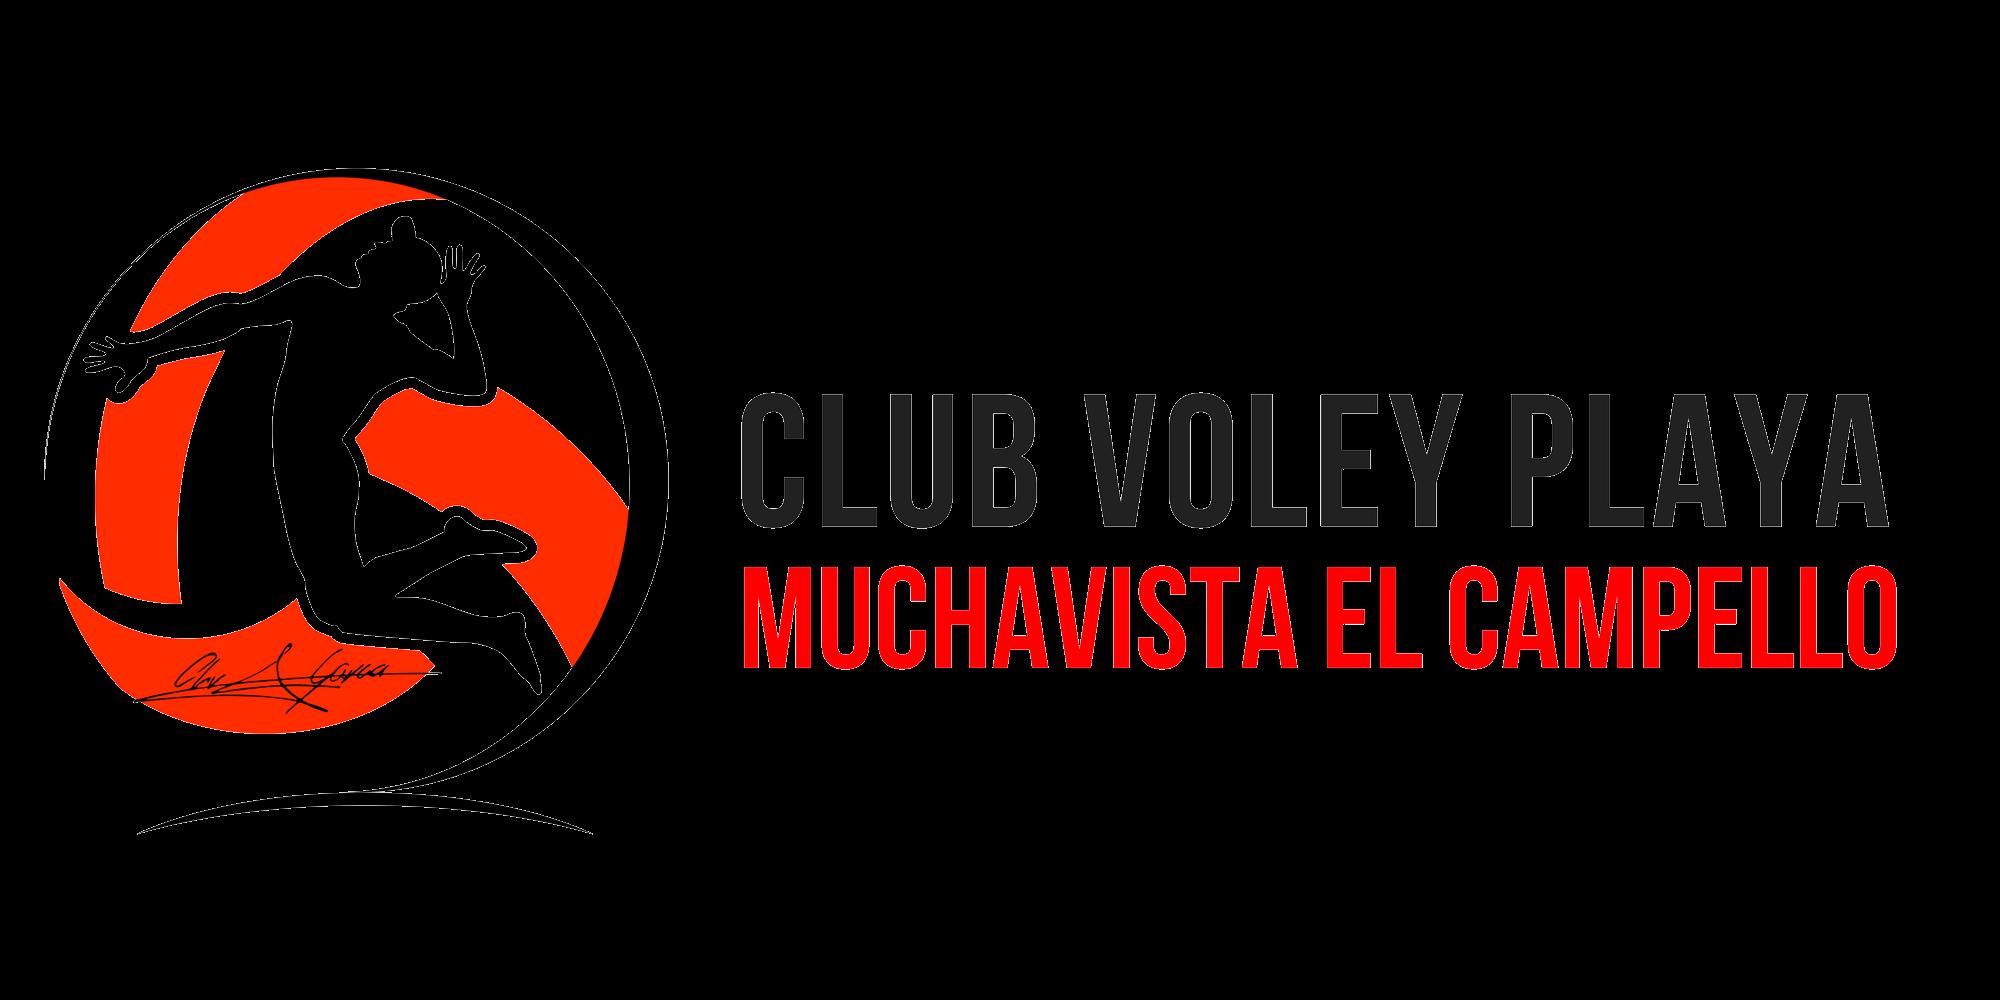 Club Voley Playa Muchavista